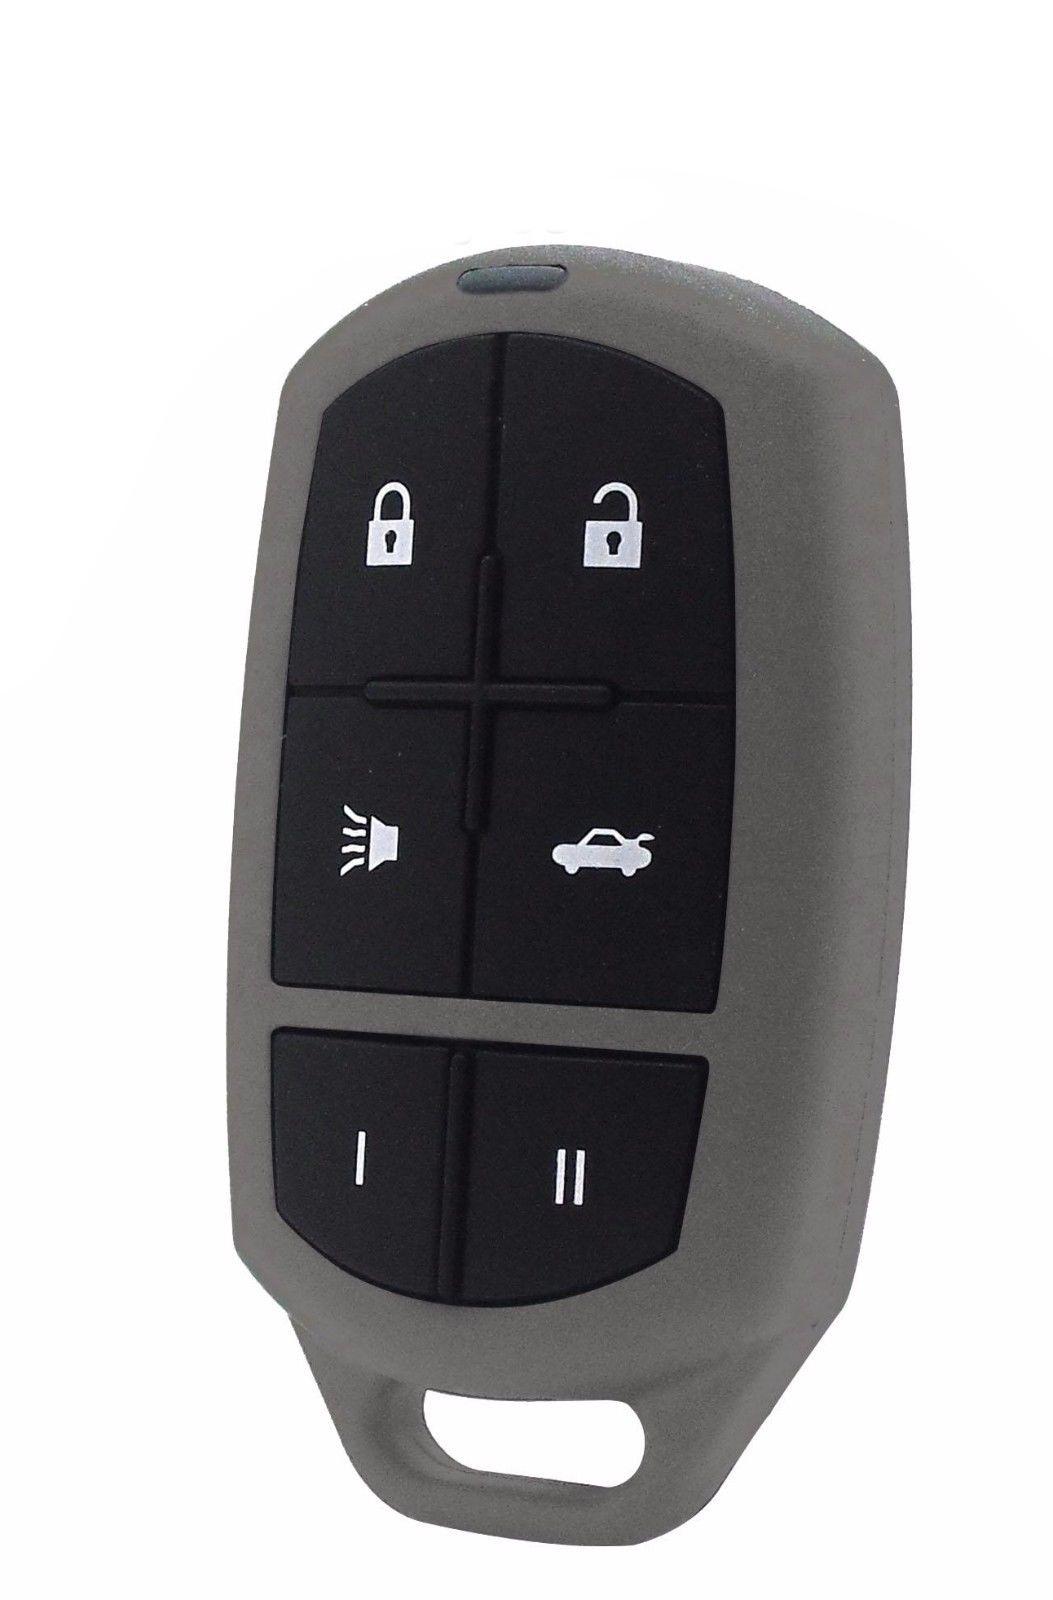 iKeyless Brand Remote Keyless Entry - 2 Button